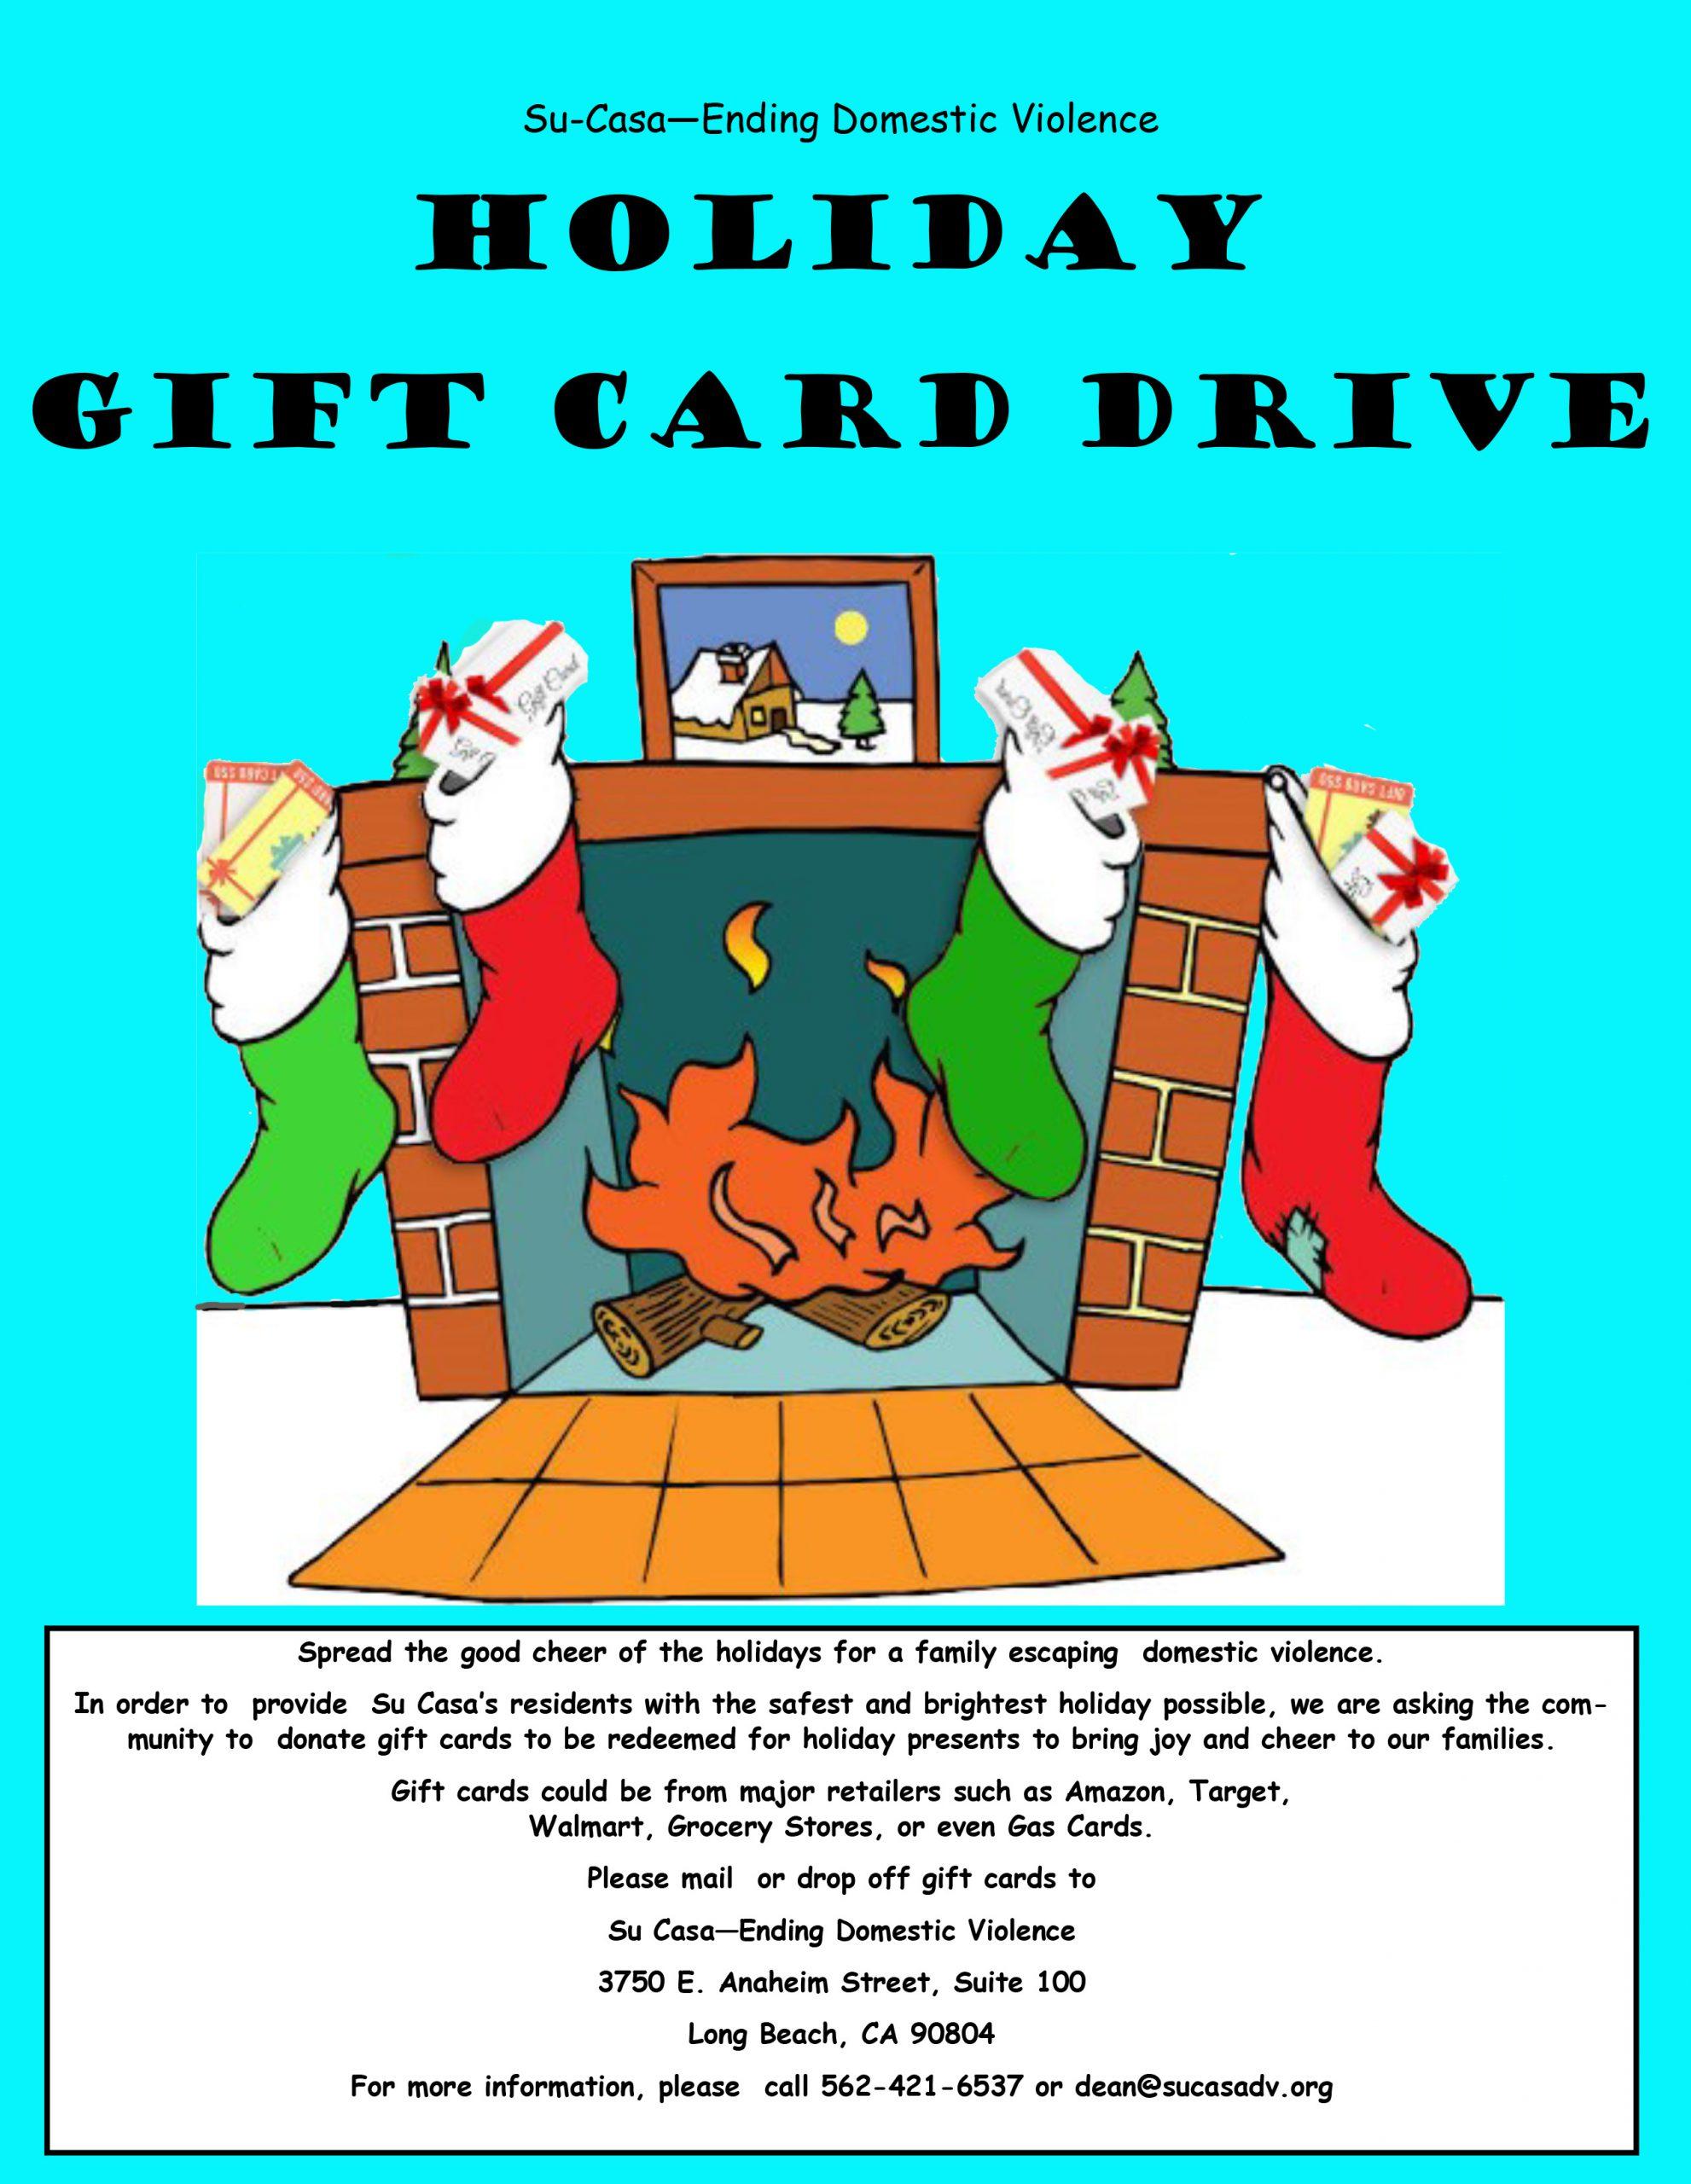 Holiday Gift Card Drive